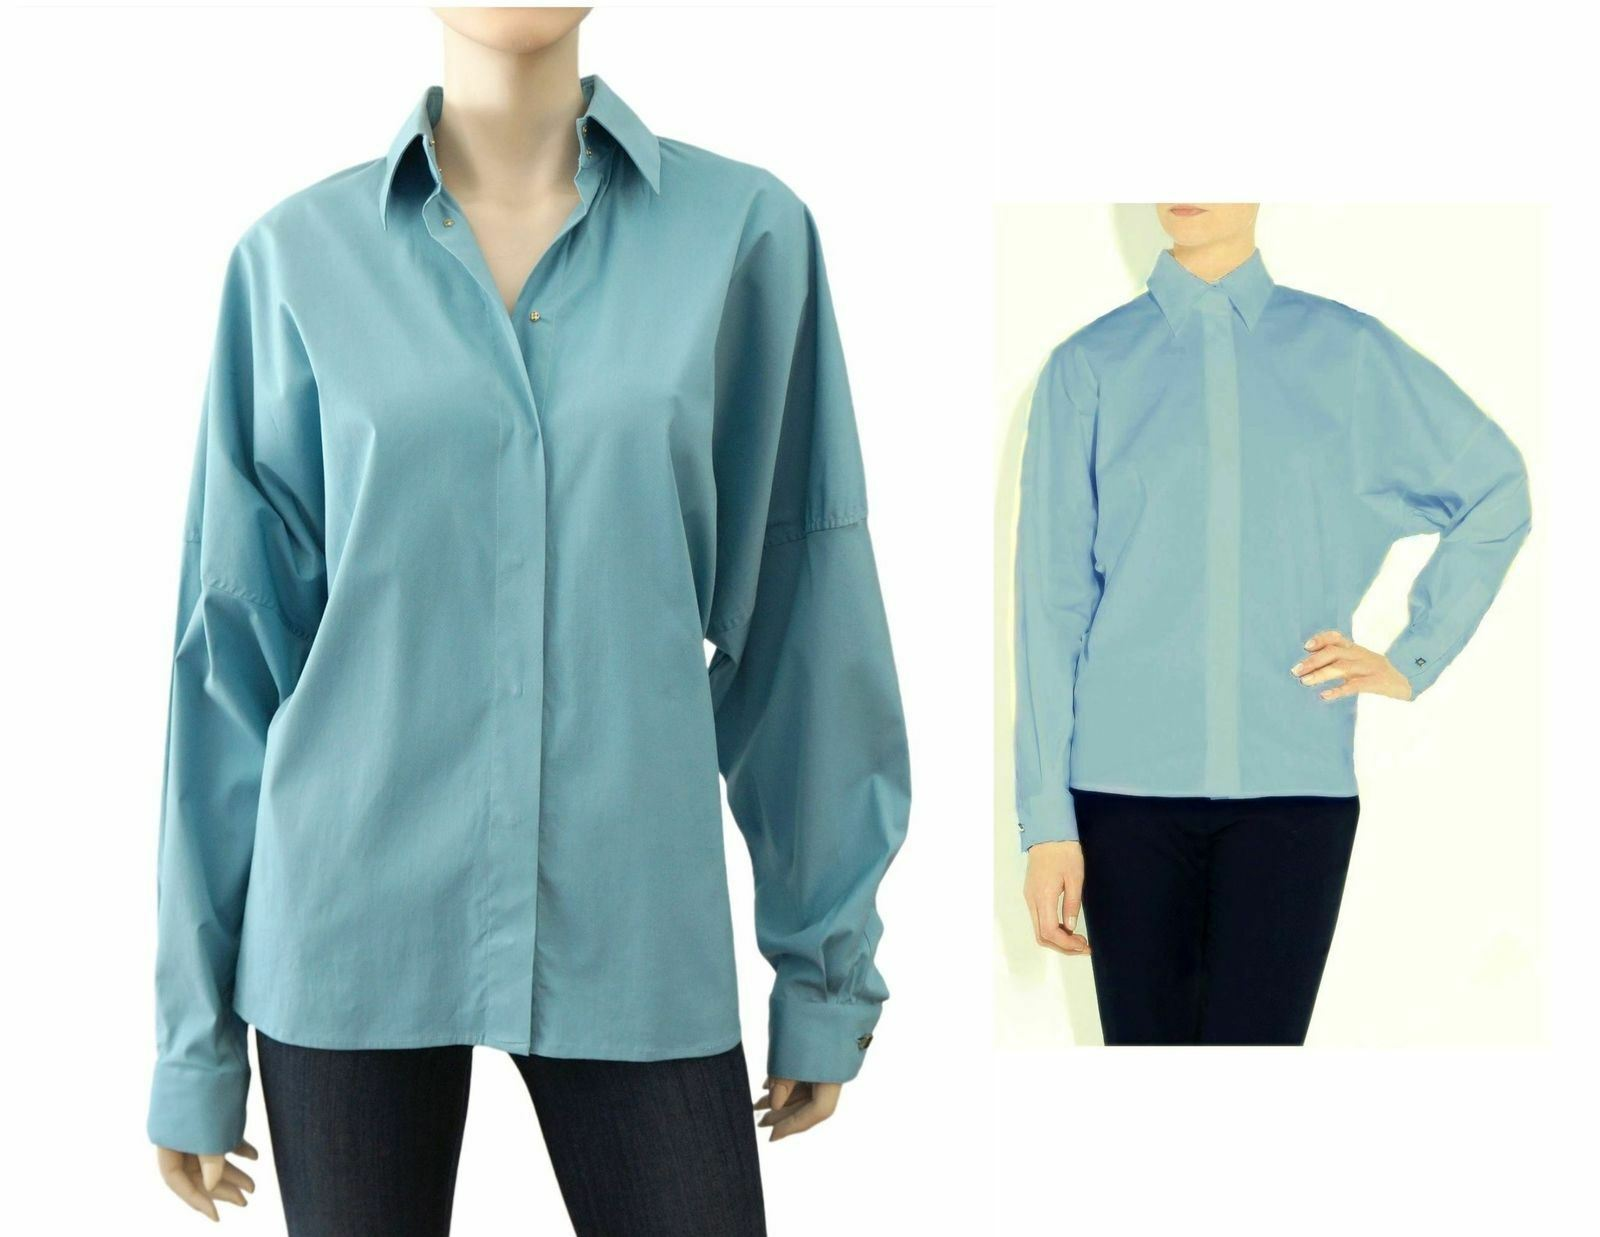 THE ROW Blau Cotton Poplin Dolman Sleeve Hemerton Shirt 10 NEW WITH TAGS